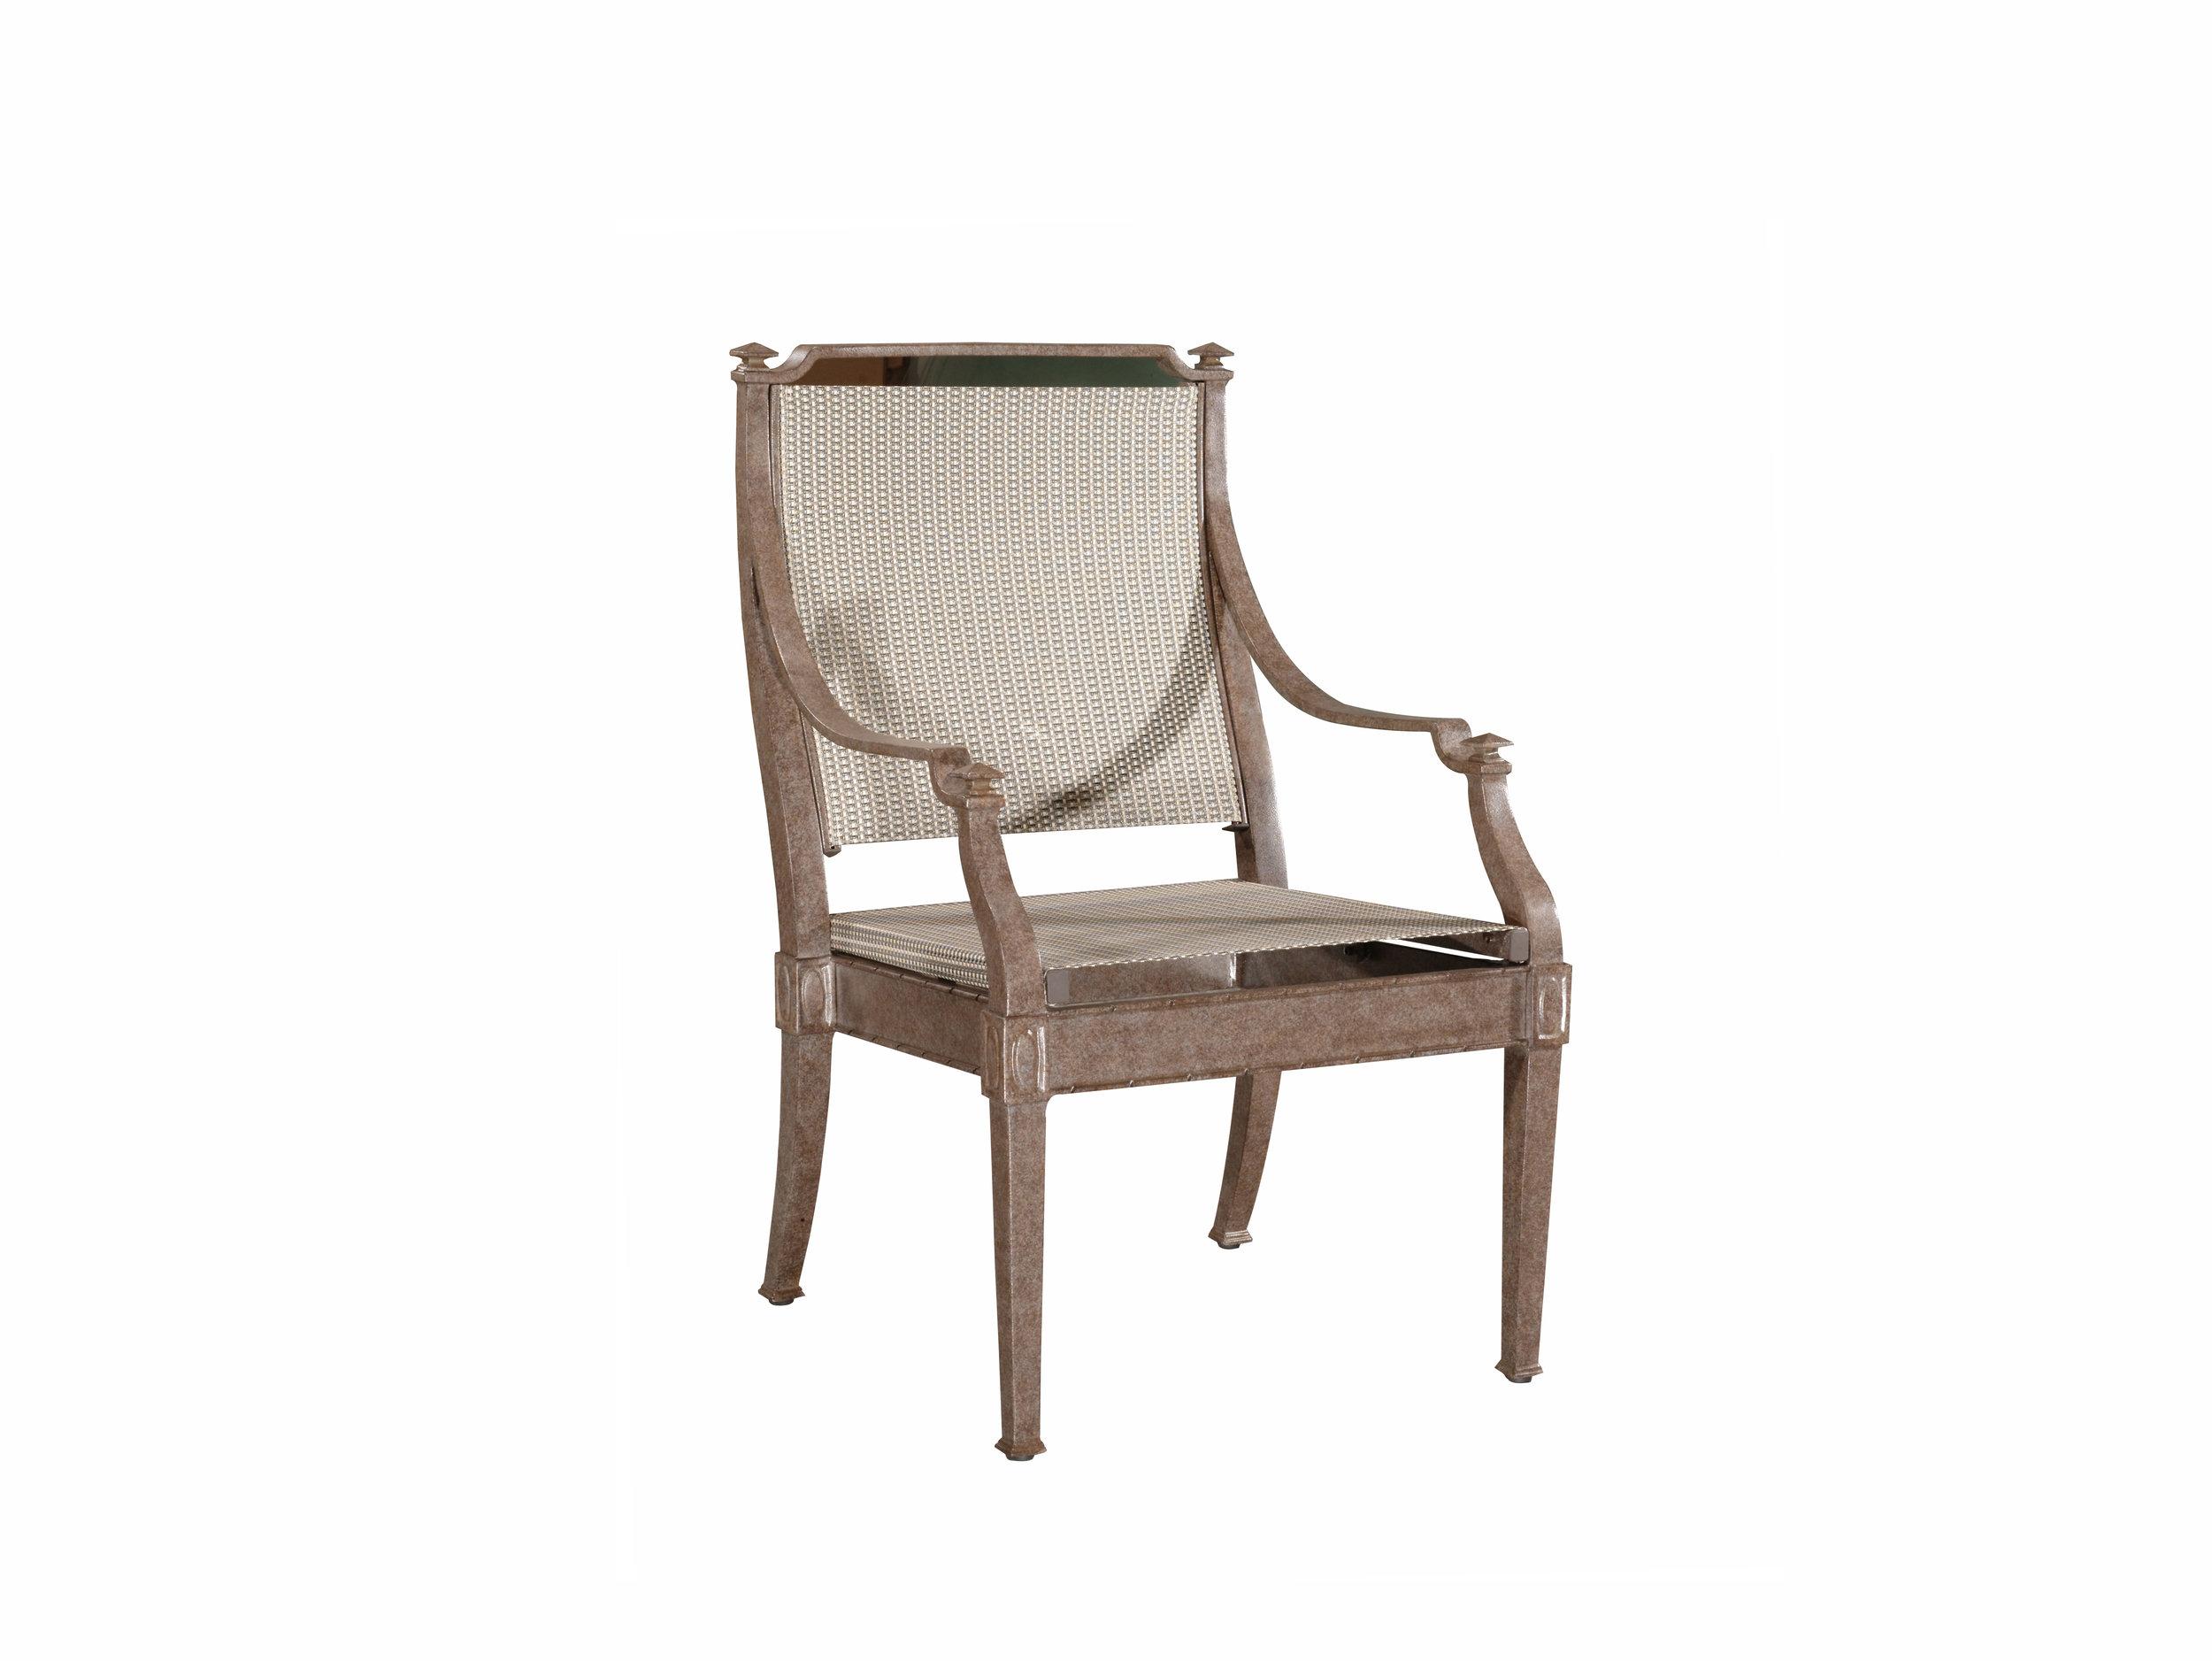 "972019 Newport Sling Dining Arm Chair   23.4"" x 27.3"" x 38.3"""